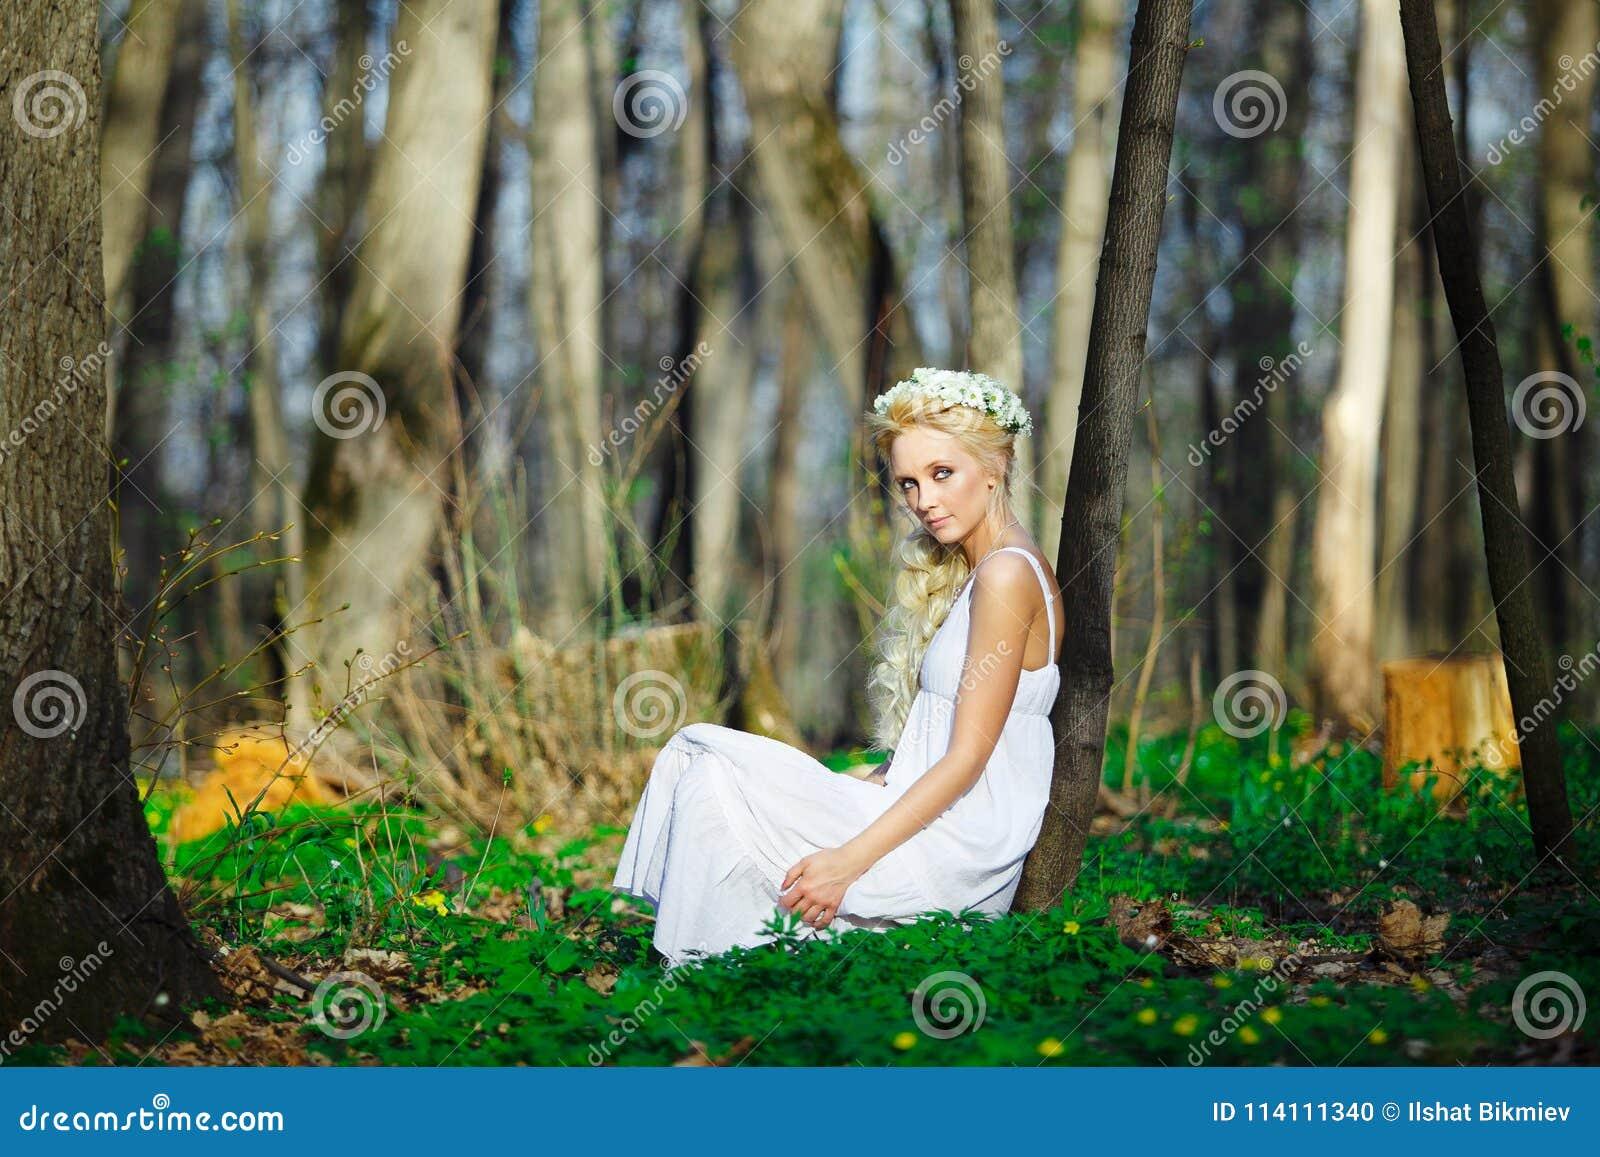 Femme La Robe Guirlande Dans Avec Sur Blanche Belle lKT13FJc